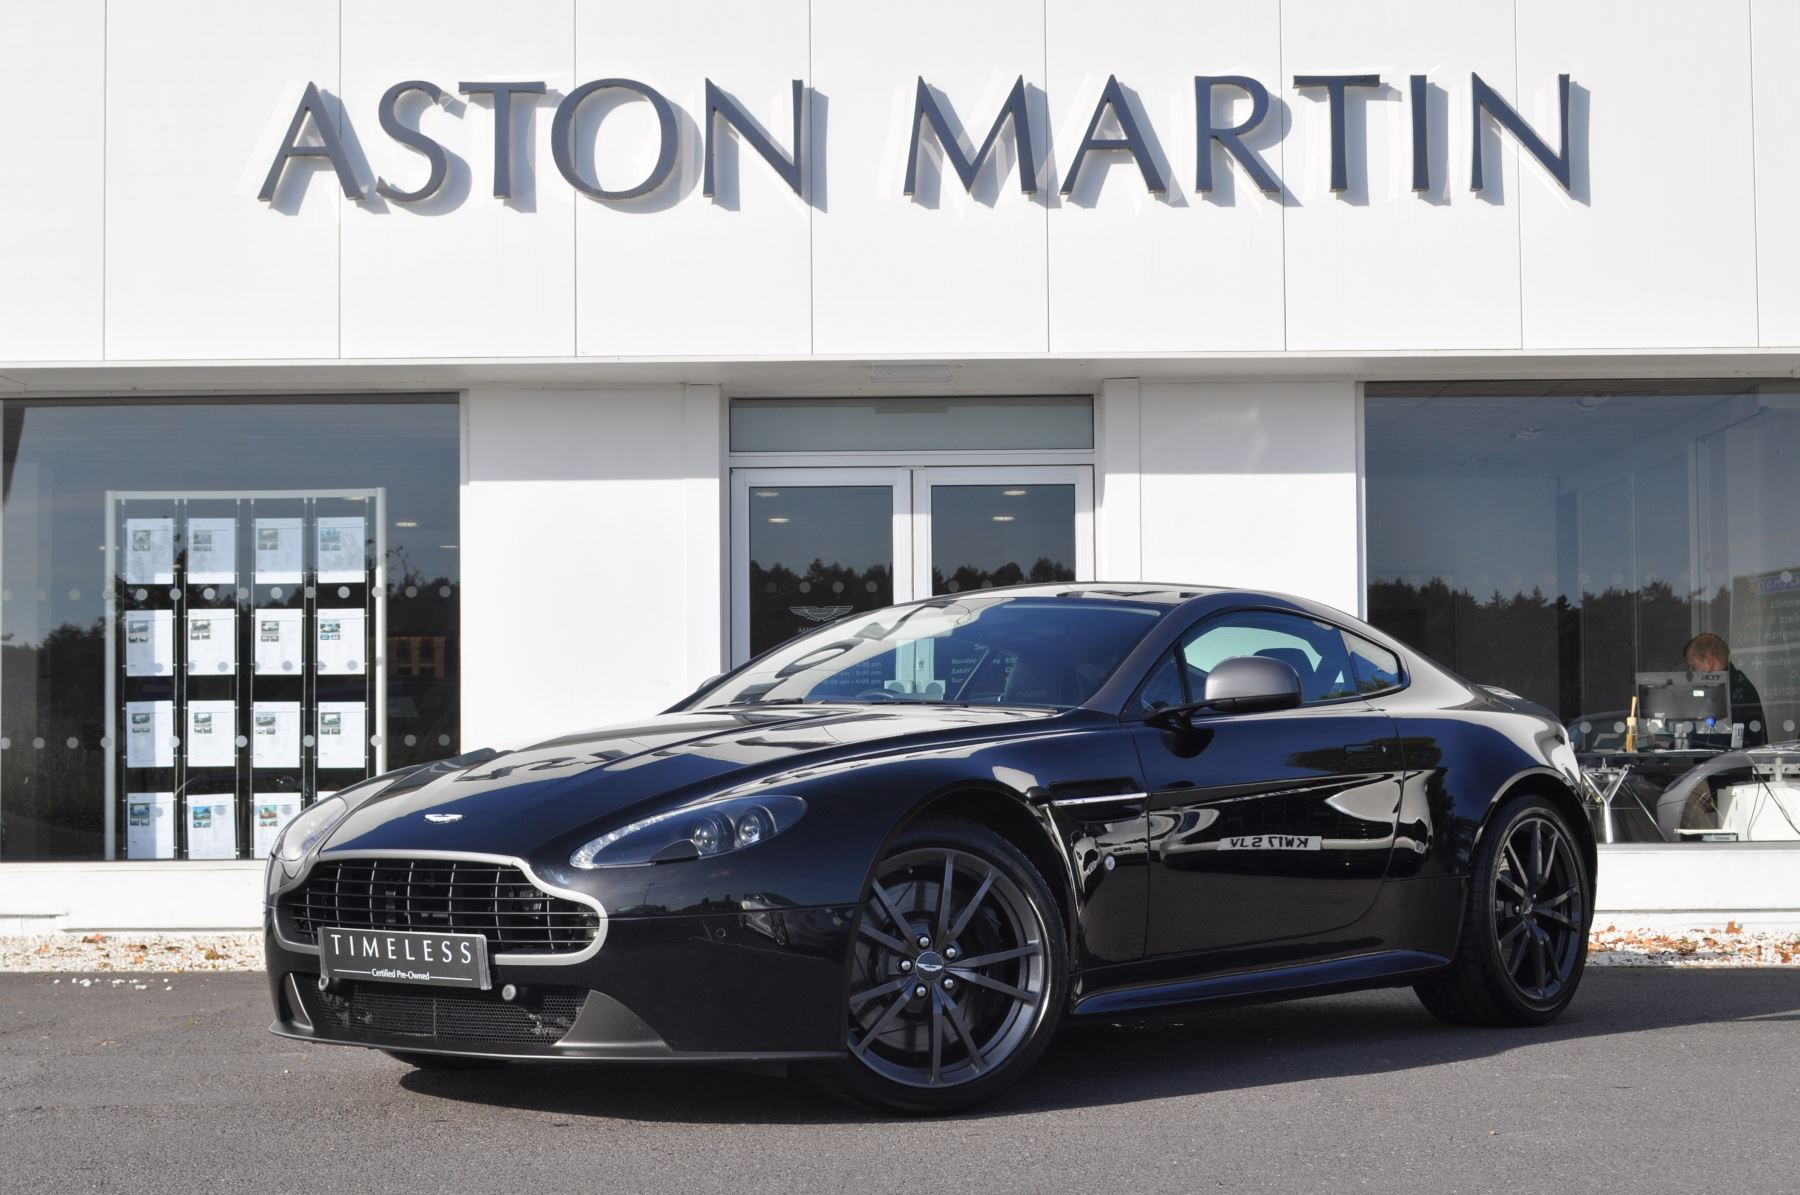 Aston Martin Vantage N430 N430 2dr Sportshift II 4.7 Automatic 3 door Coupe (2015) image